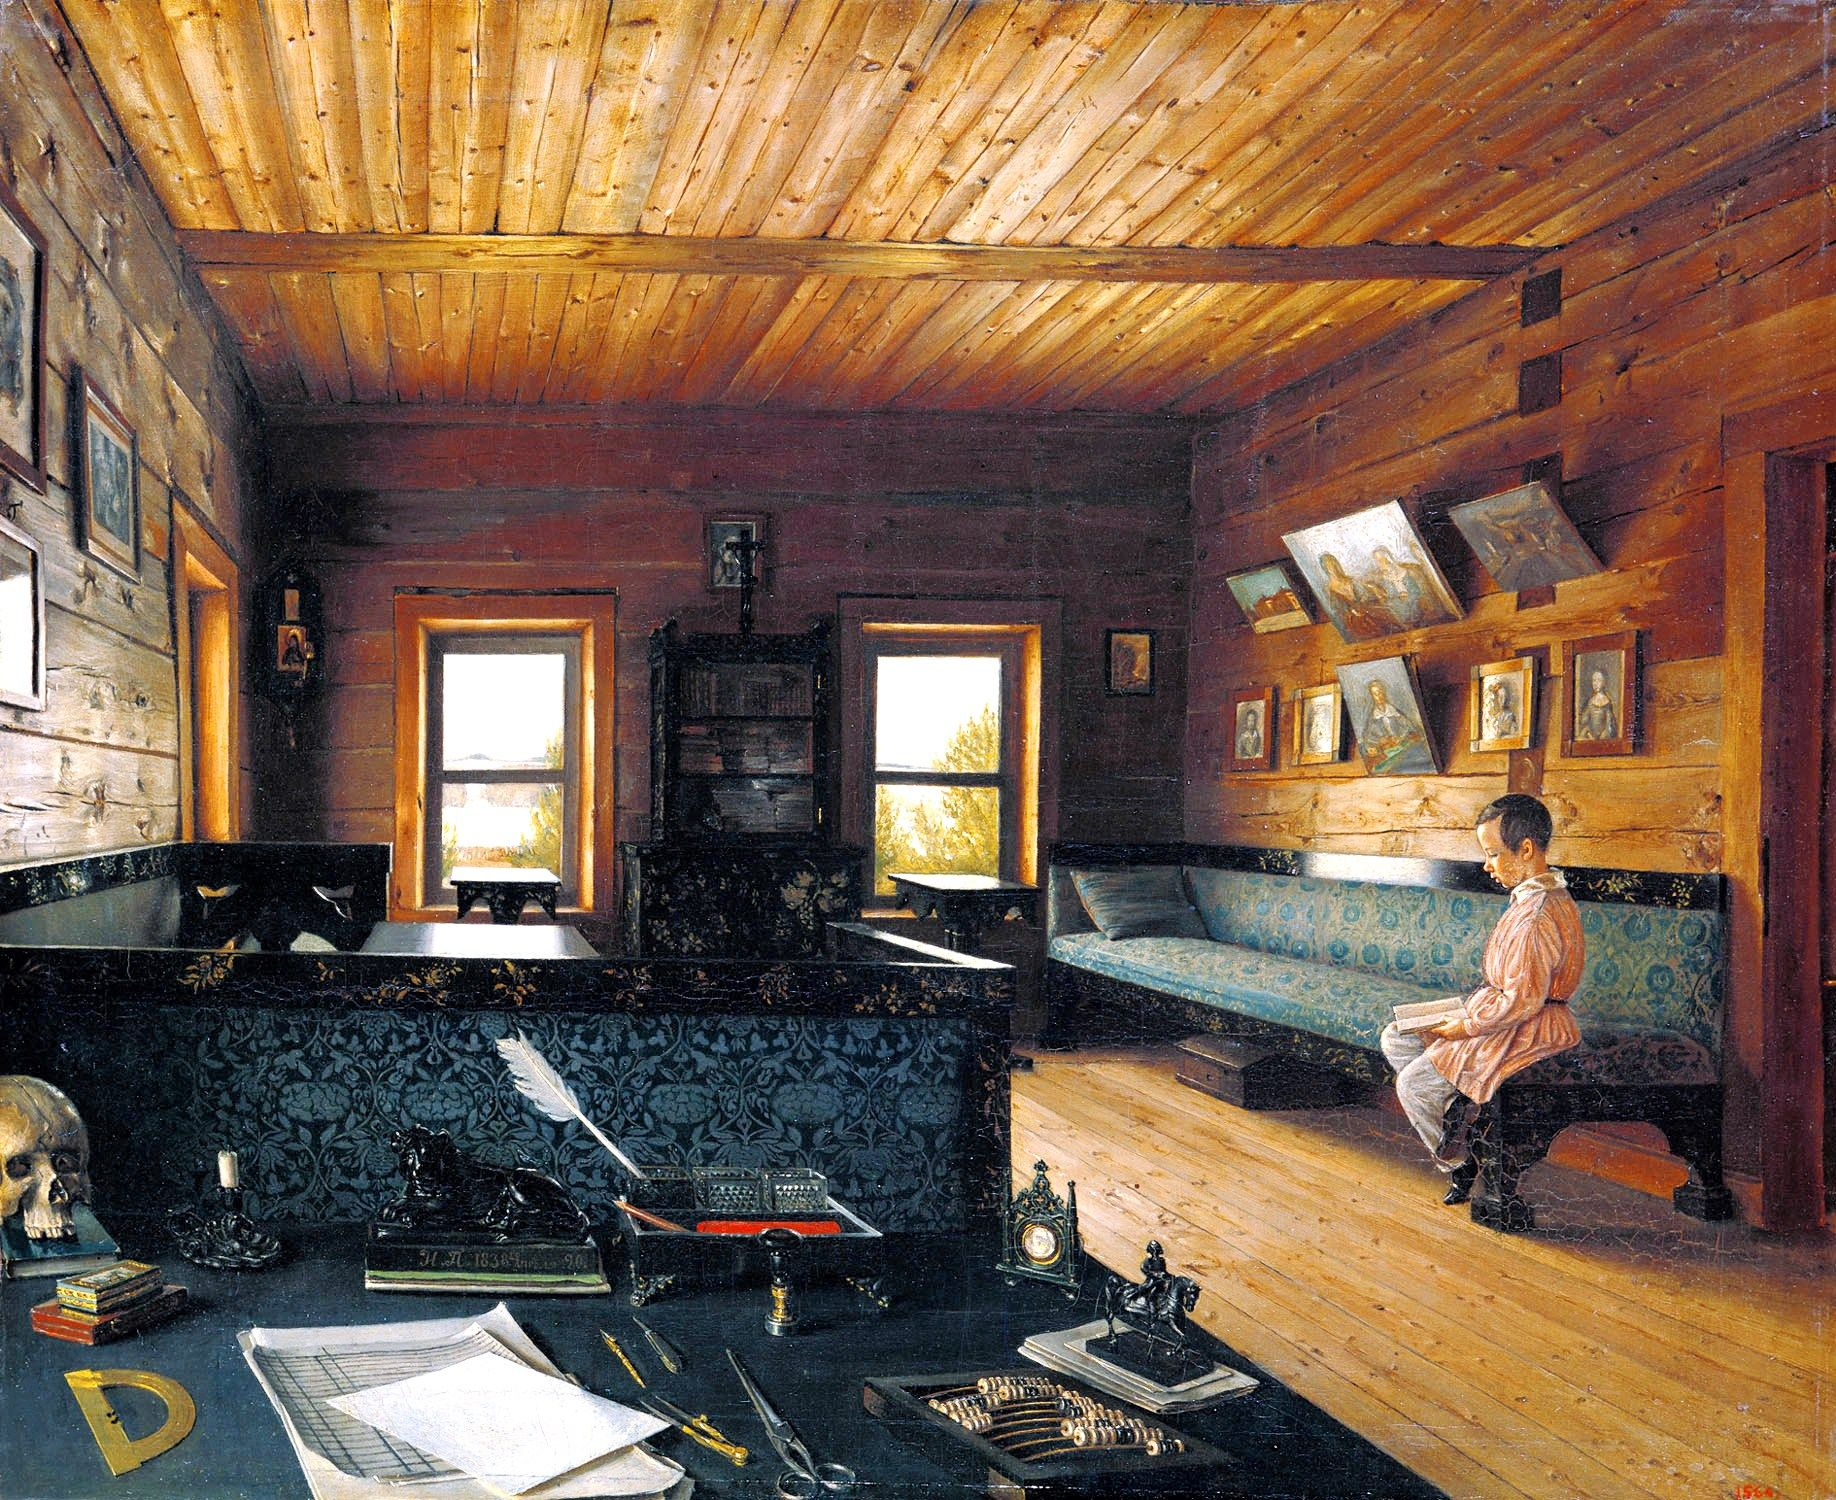 Interior - Russian house, Dr. Zhivago rustic 19th Century ...